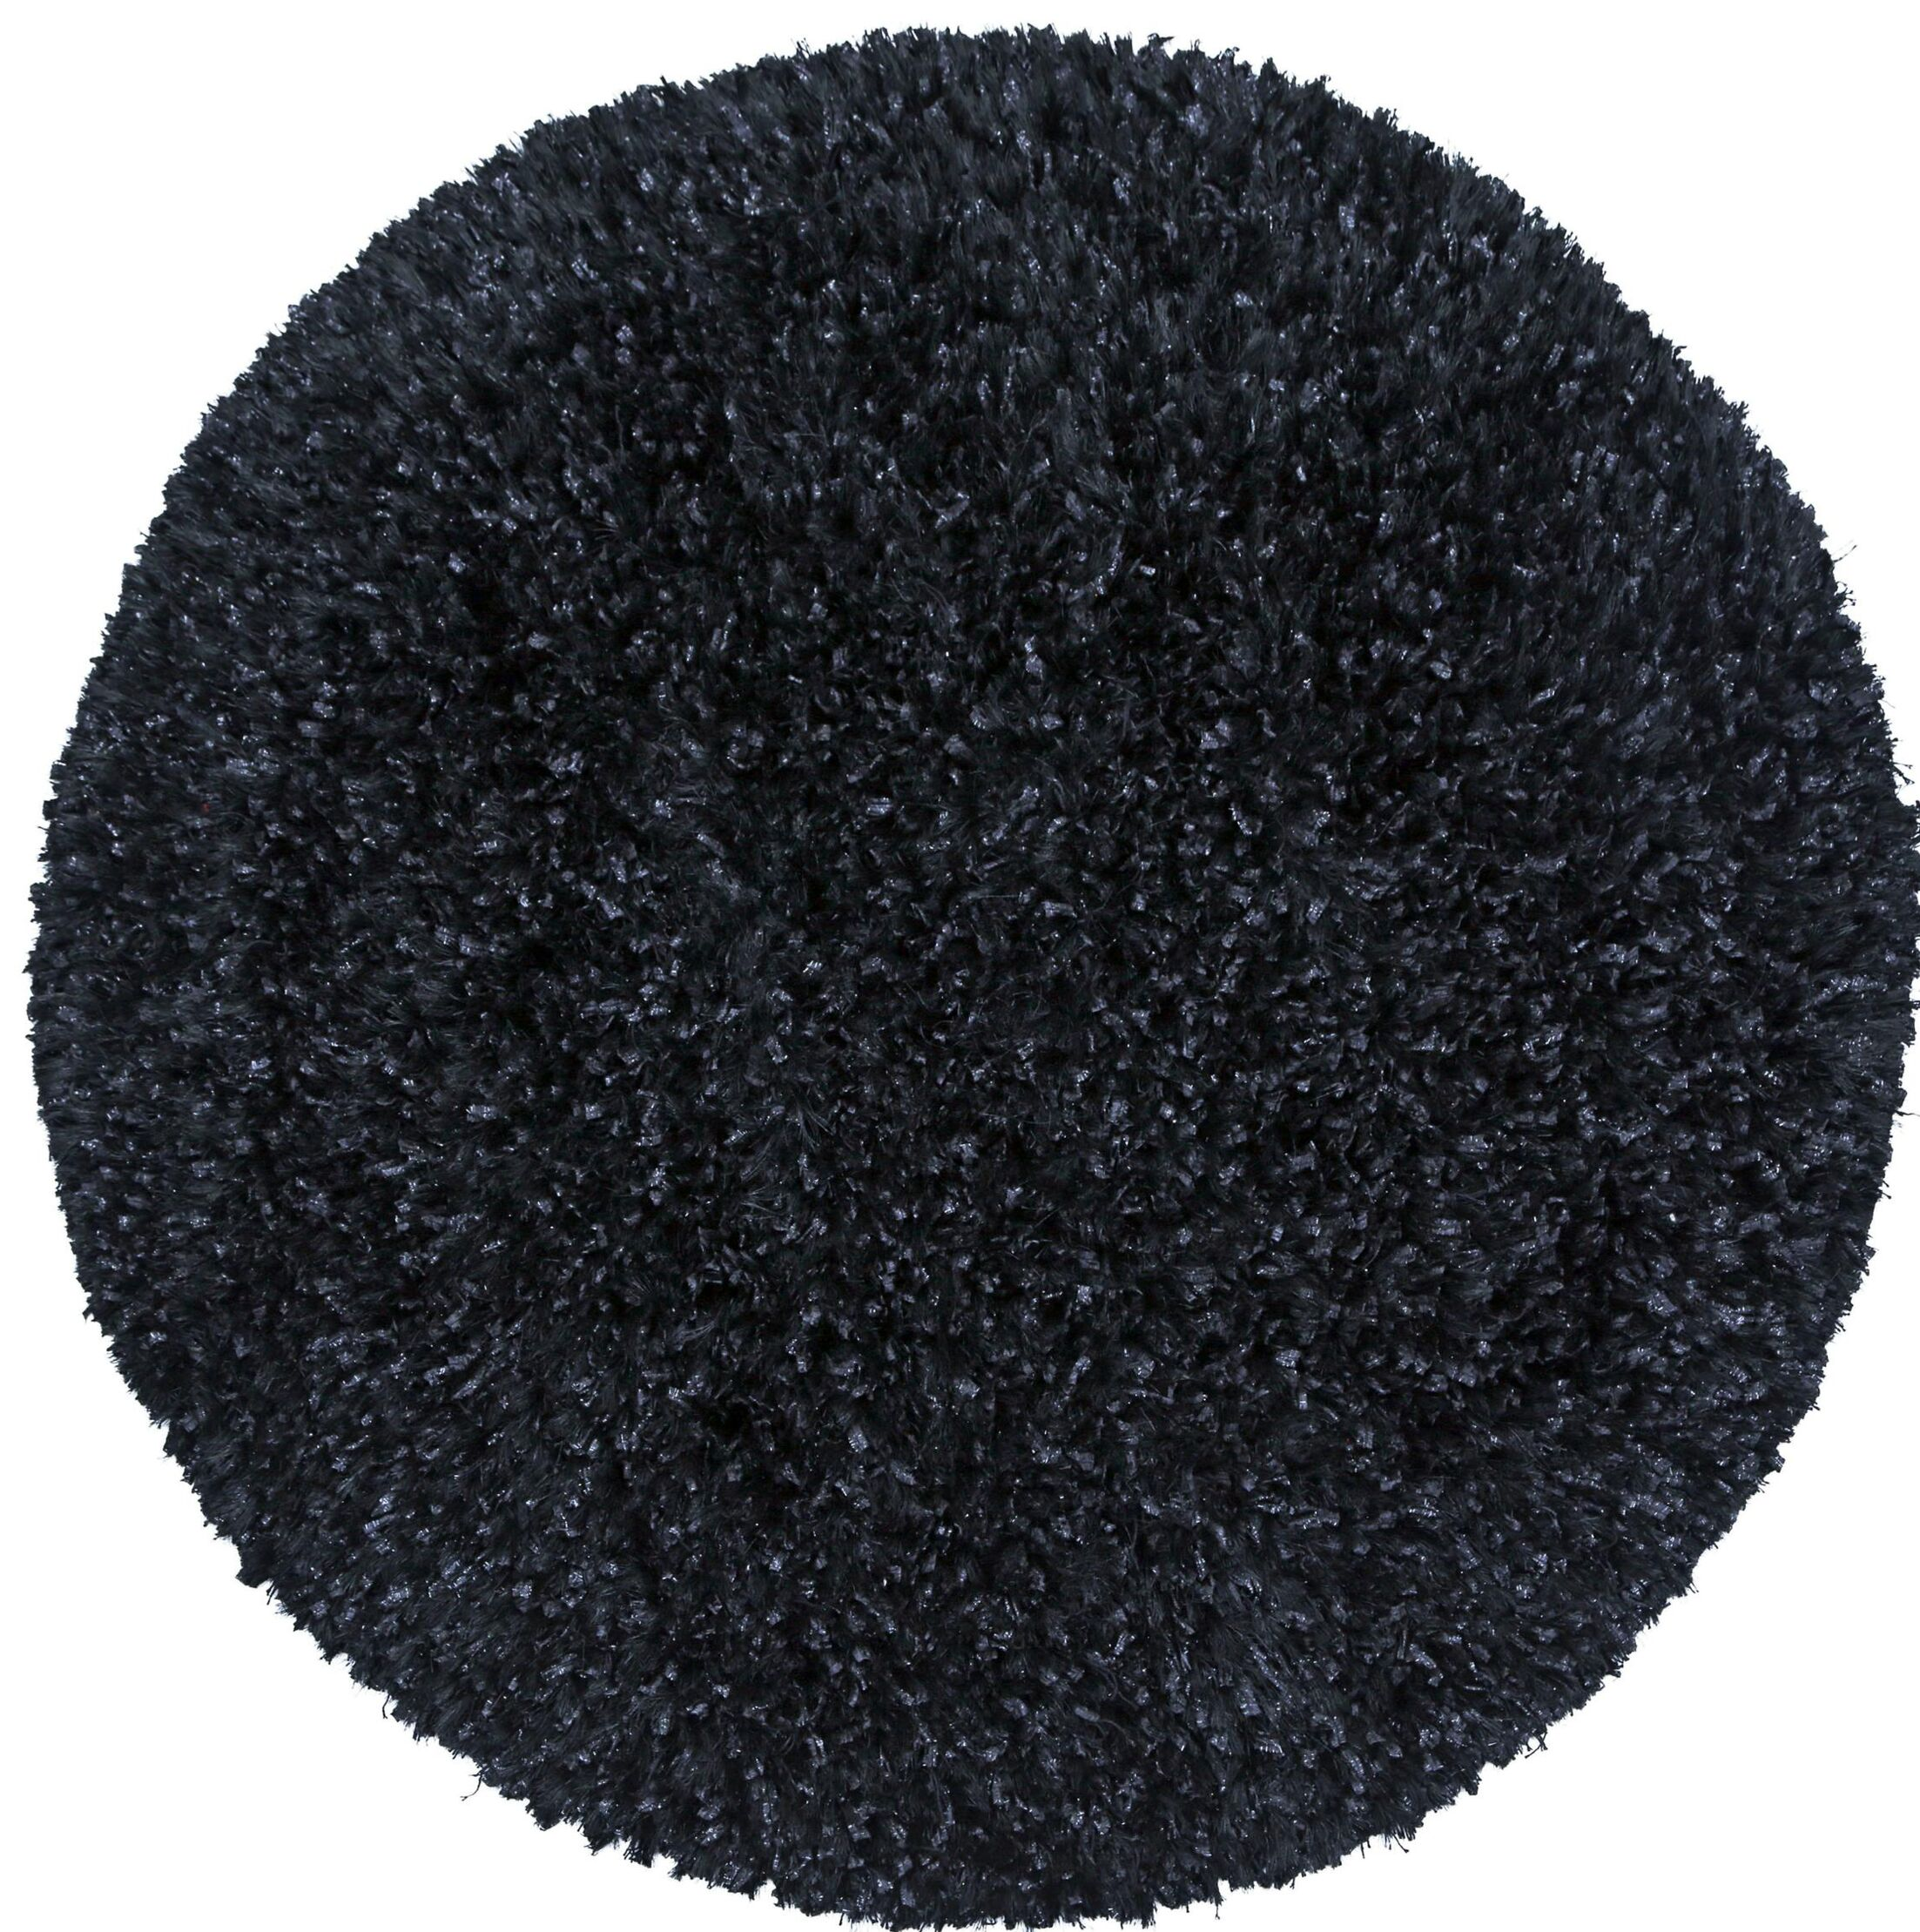 Baumann Hand-Loomed Black Area Rug Rug Size: Round 2'